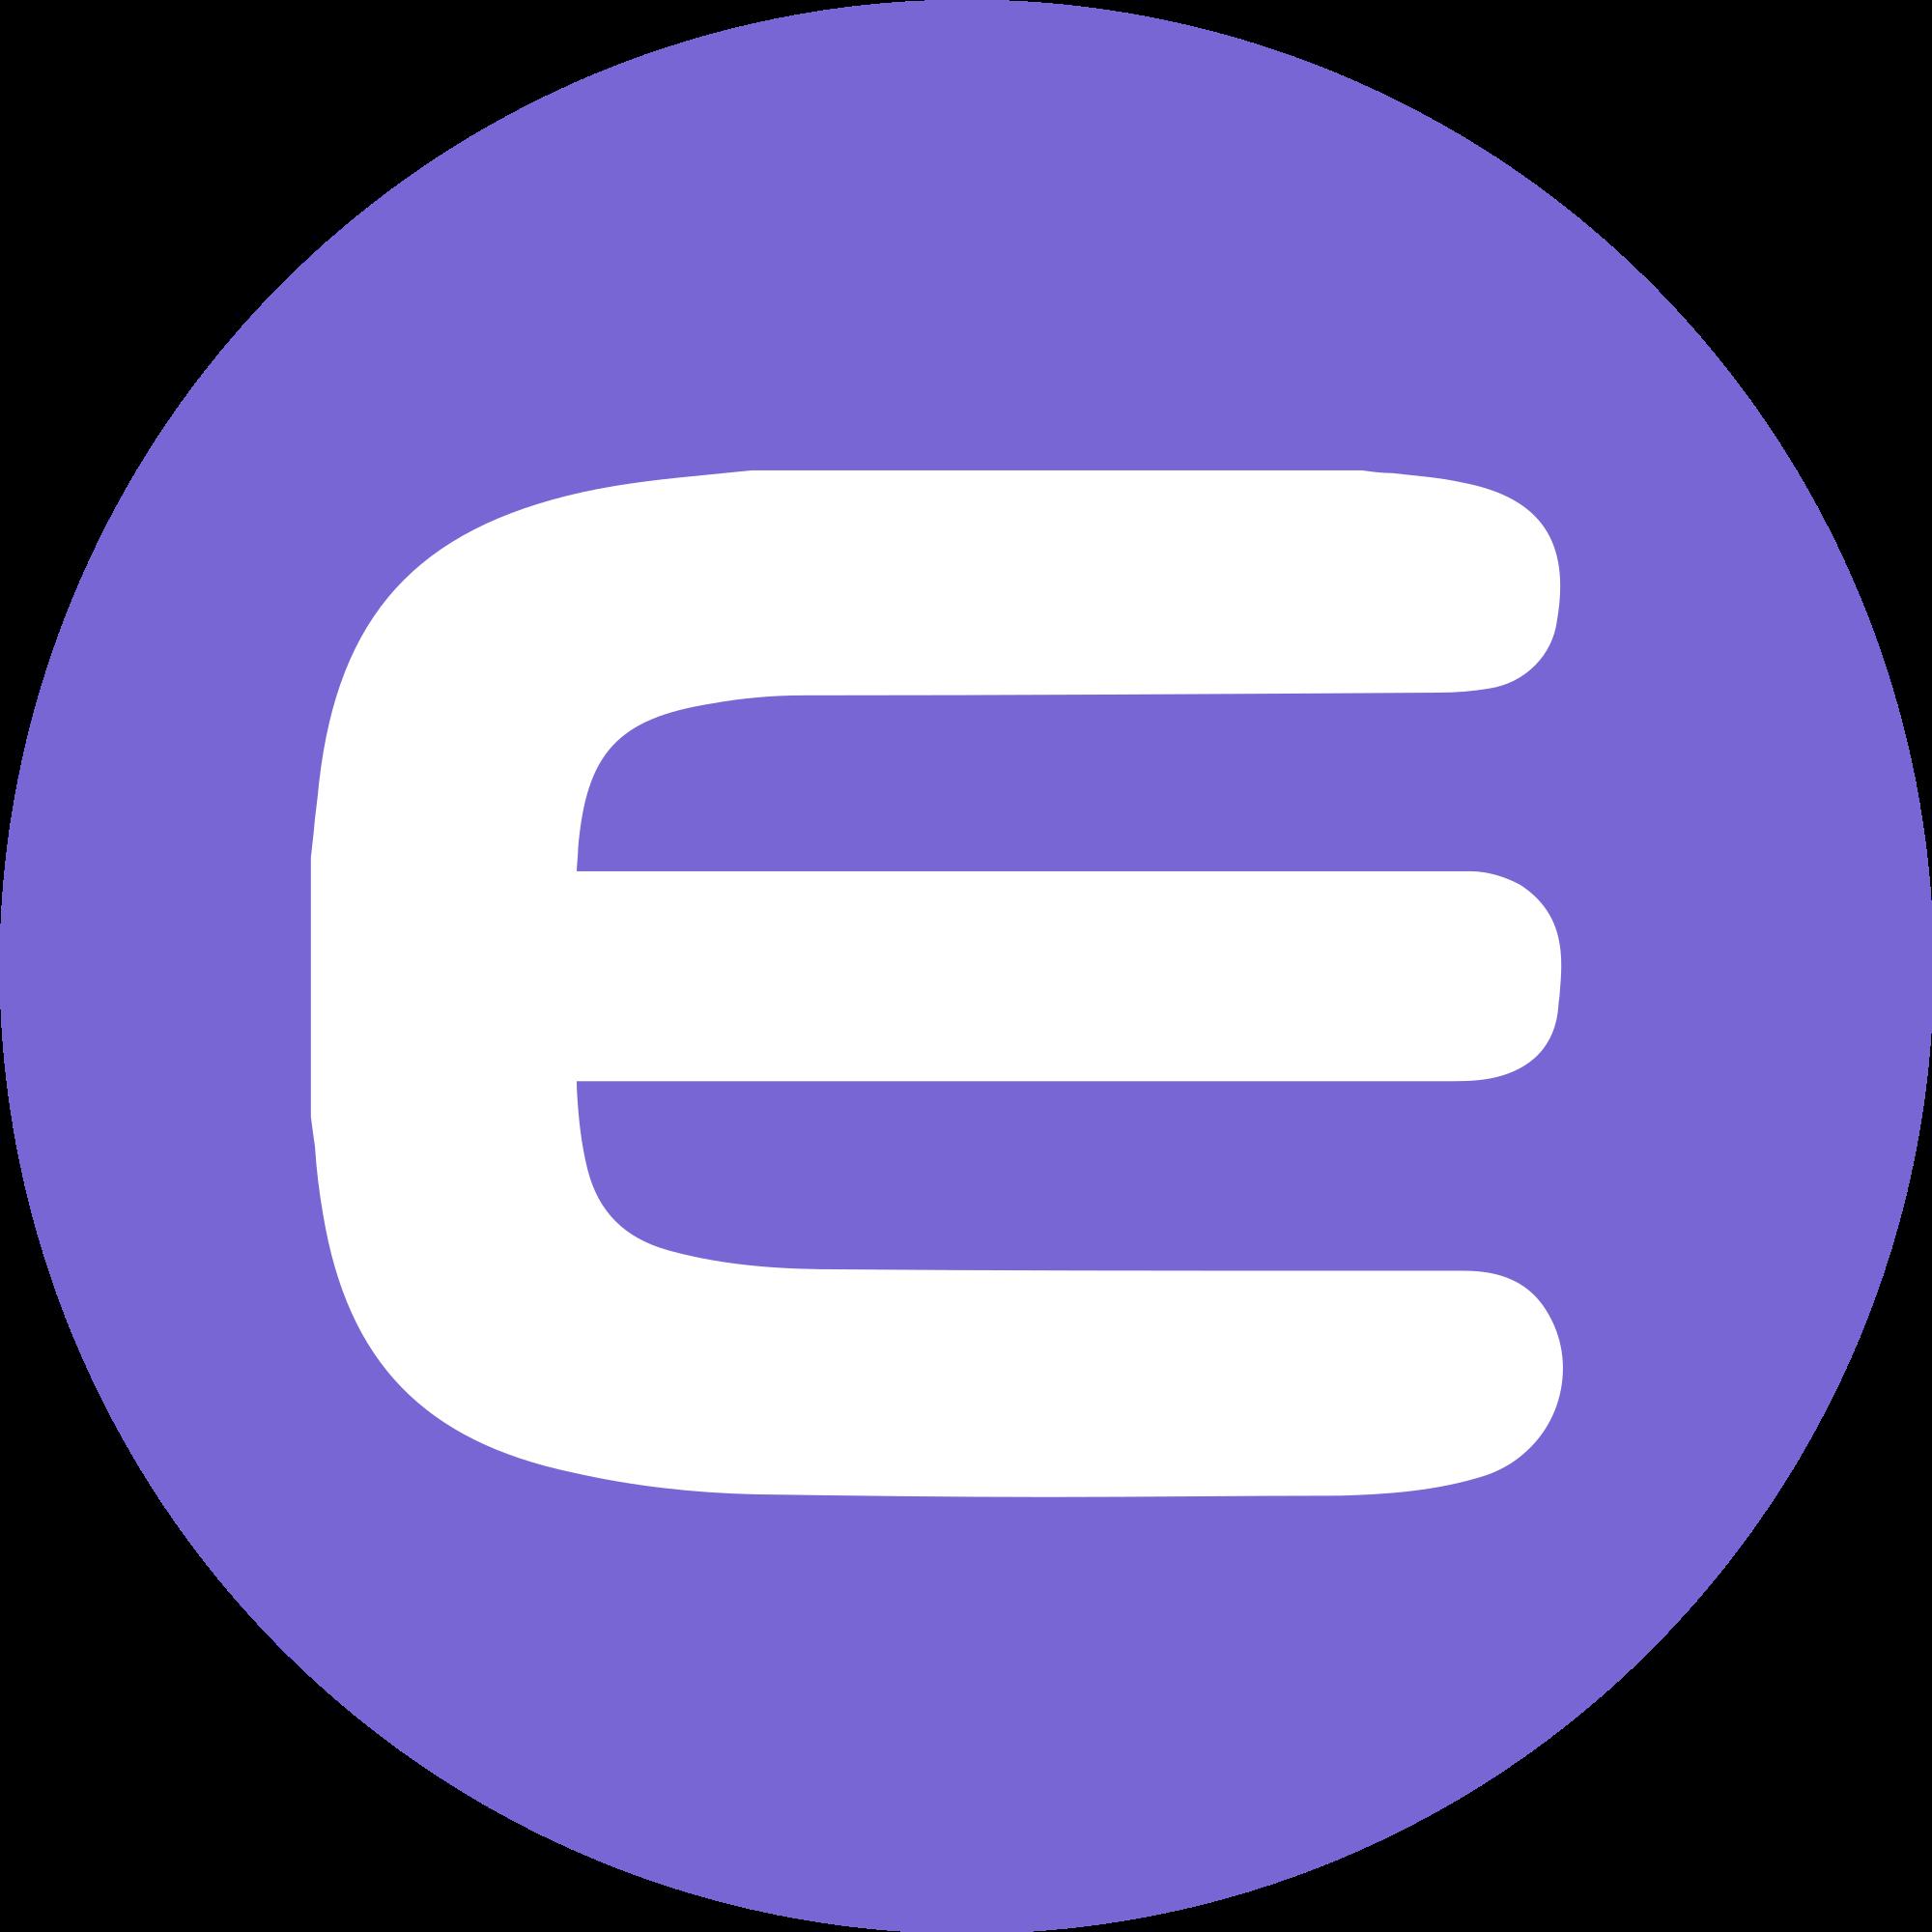 Enjin